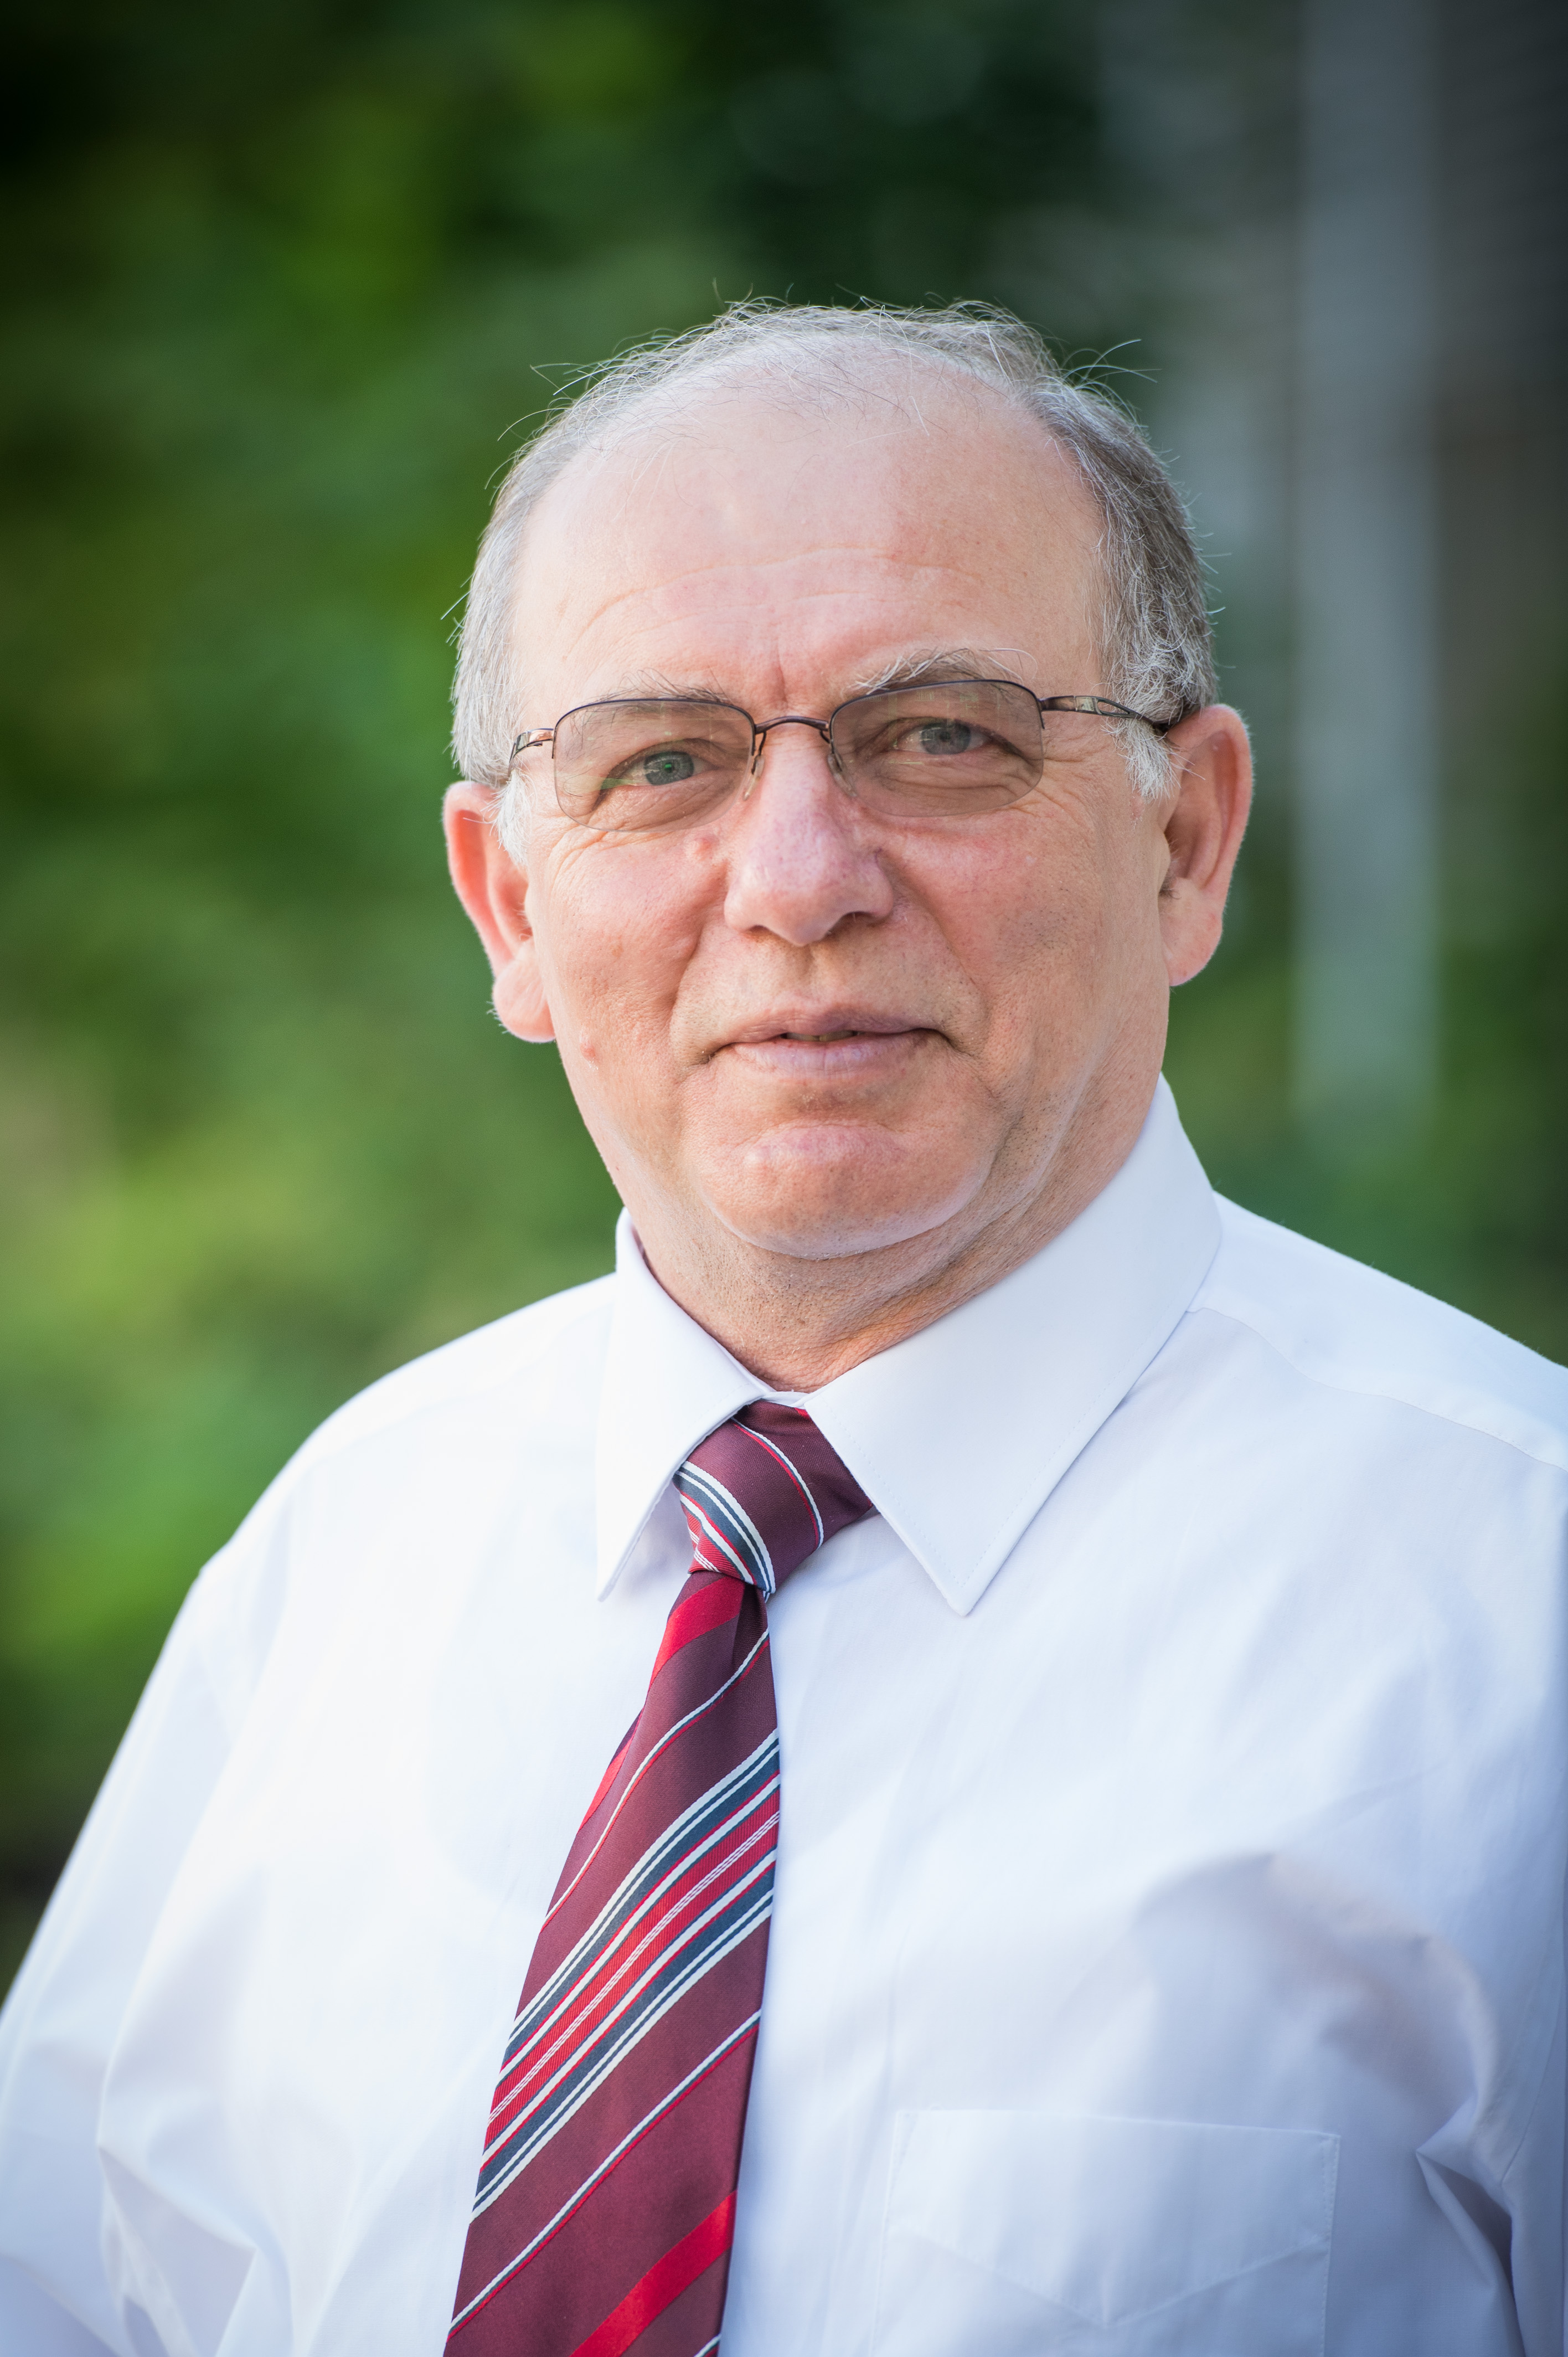 Yusuf Atlintas